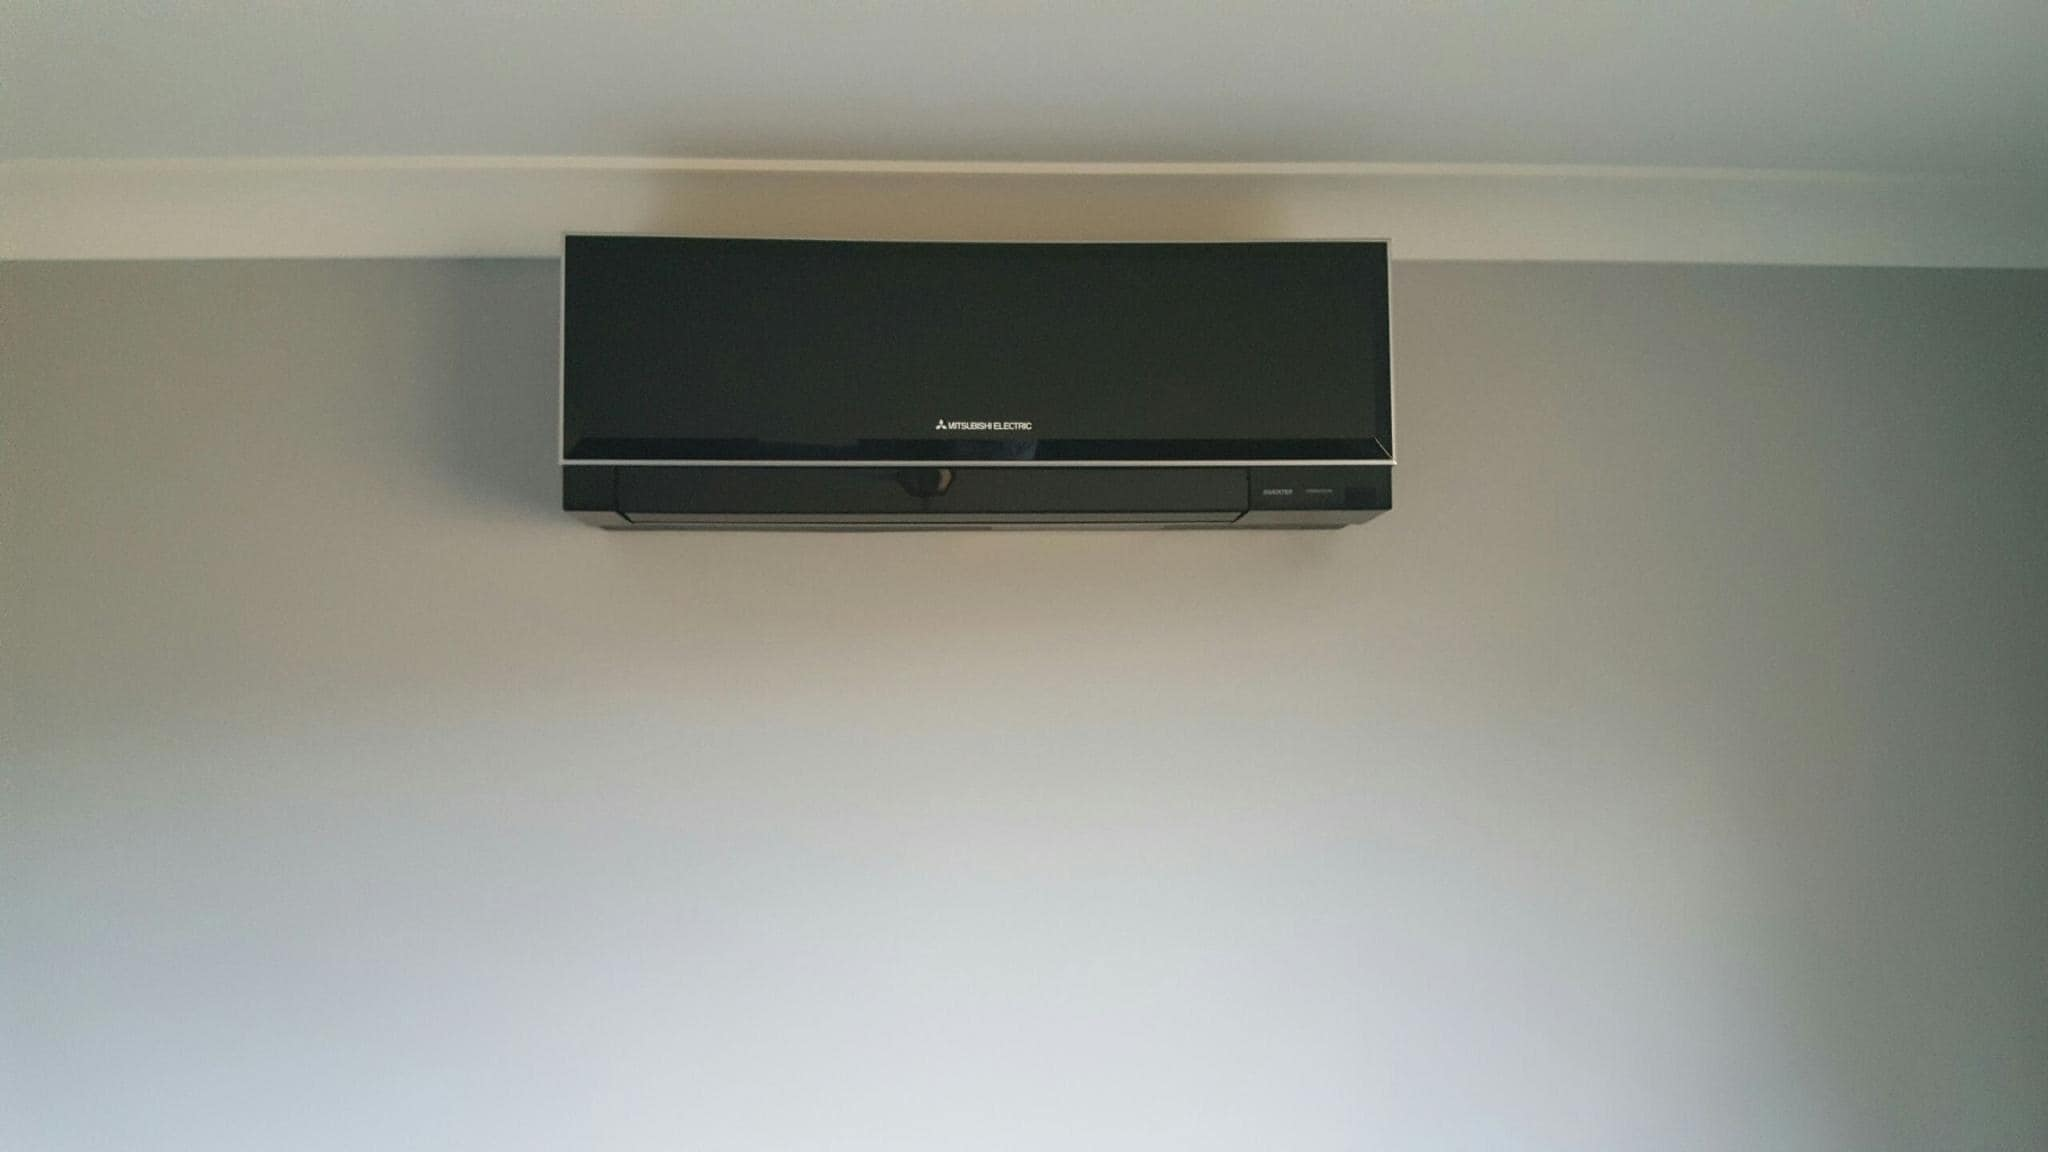 kando air conditioning on yeppoon and rockhampton, qld 4703 | whereis®